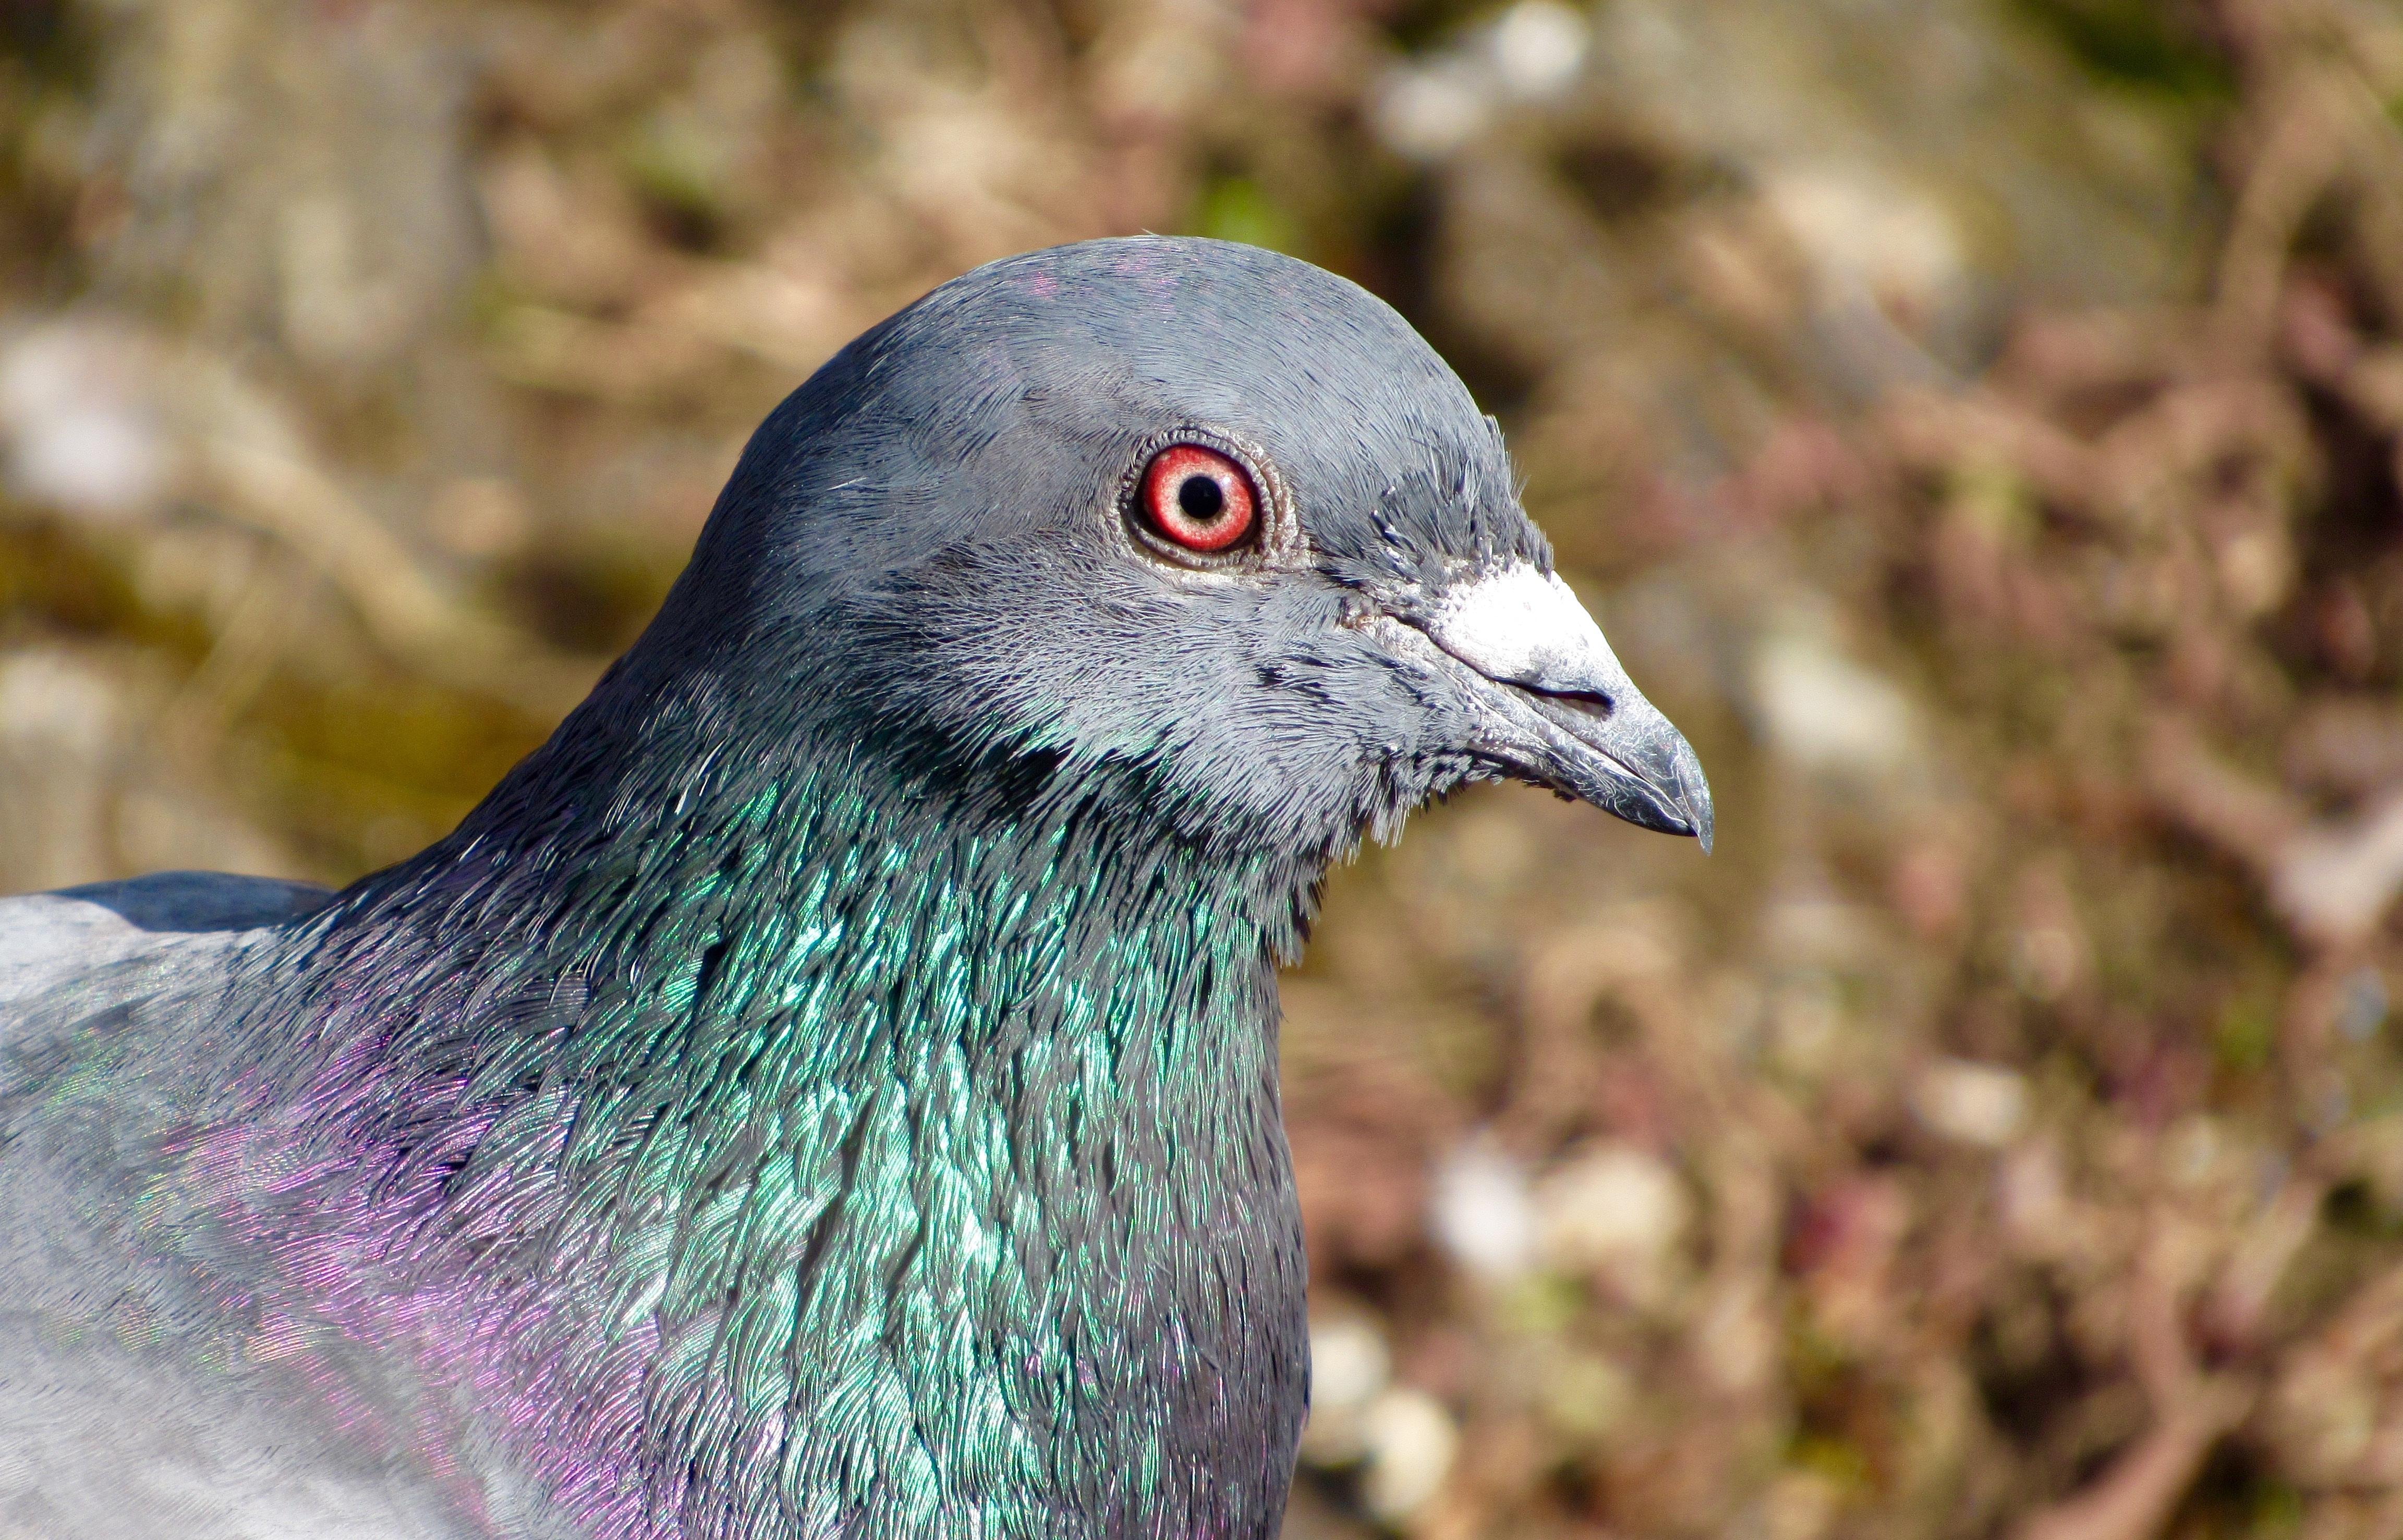 Download 106 Foto Gambar Burung Merpati Kelabu  Paling Keren Gratis